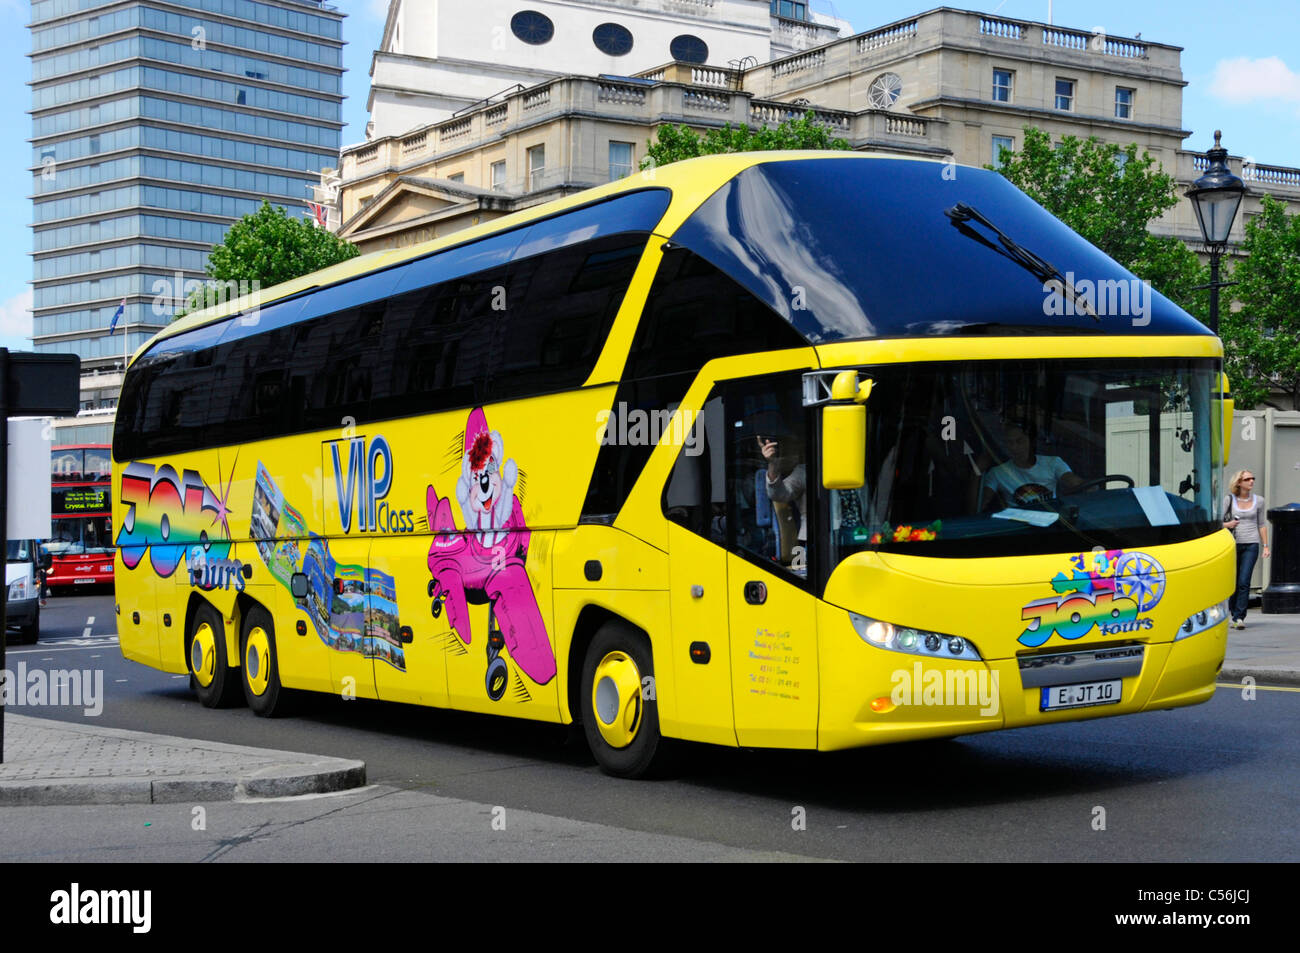 Modern yellow German tour coach with graphic design on side in Trafalgar Square London England UK - Stock Image